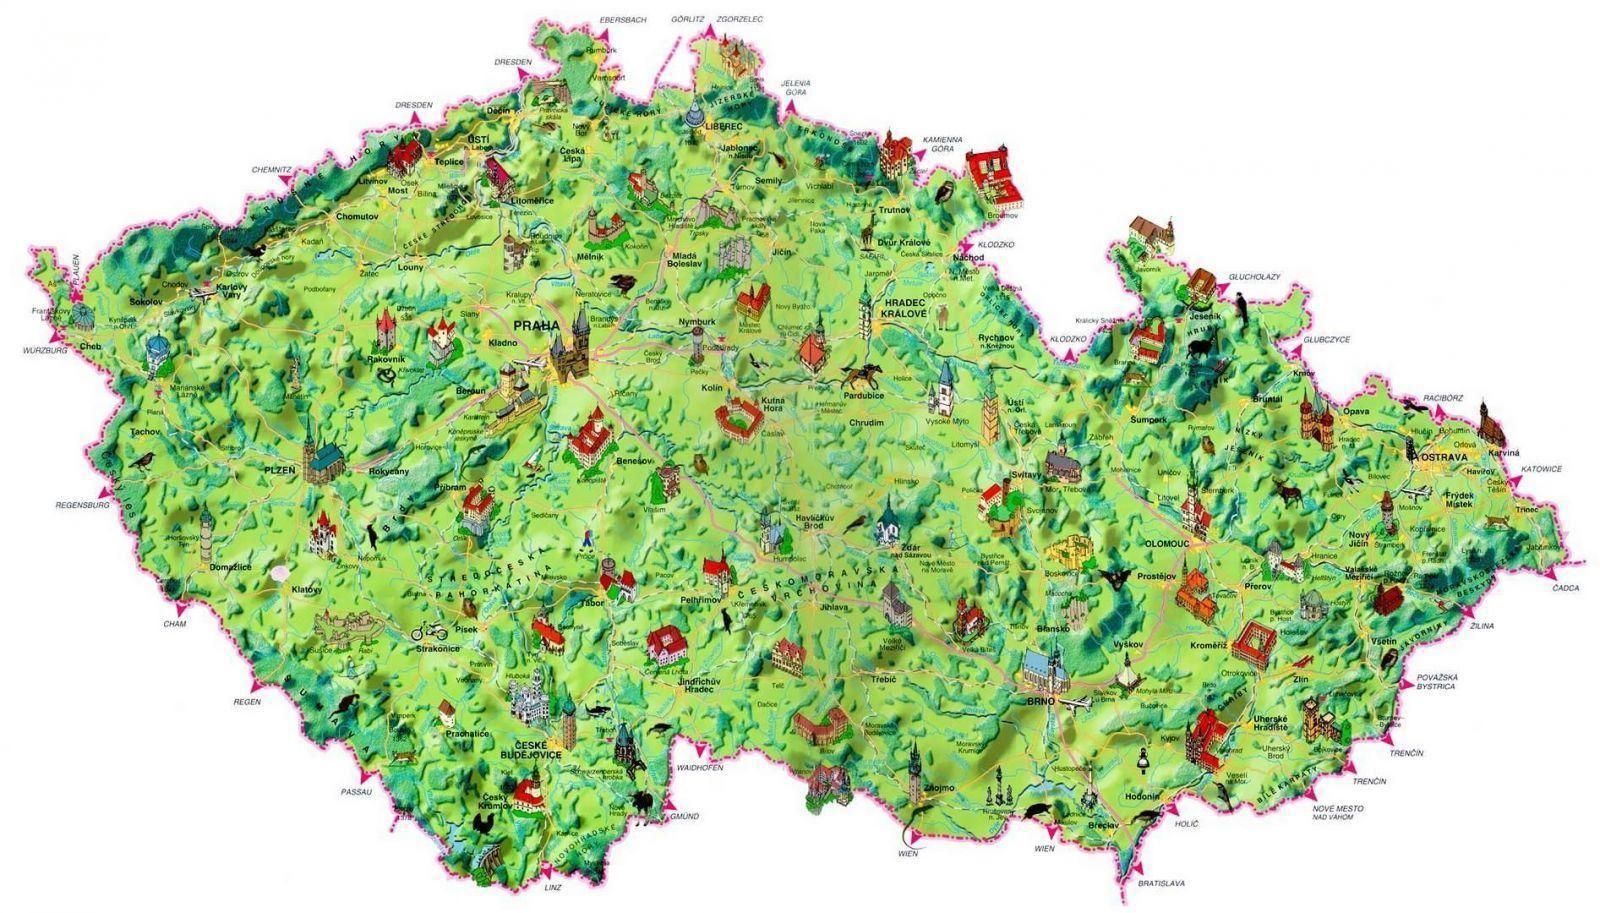 Turisticke Mapy Cr Online Znacky Na Mape